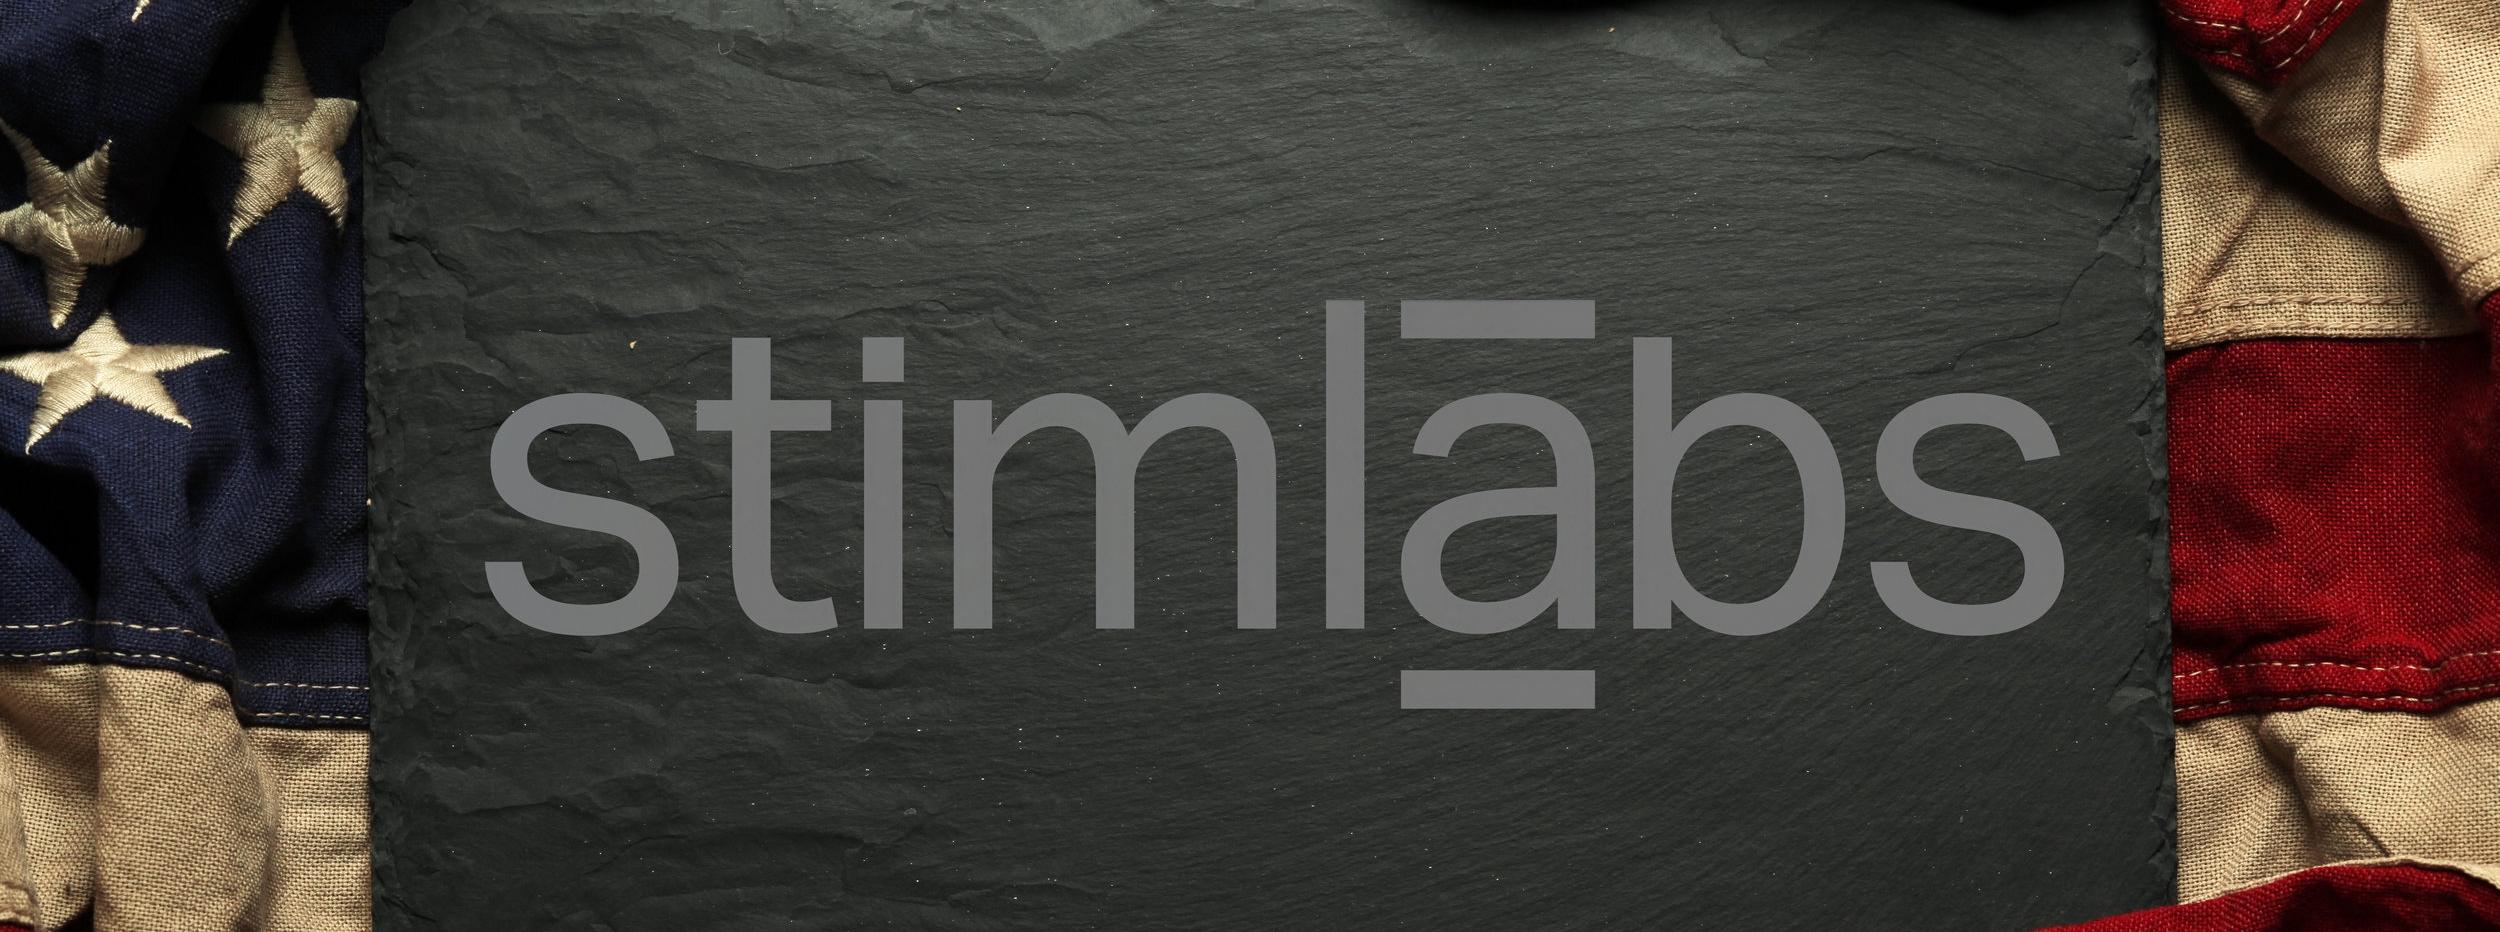 AdobeStock_85422454.jpg